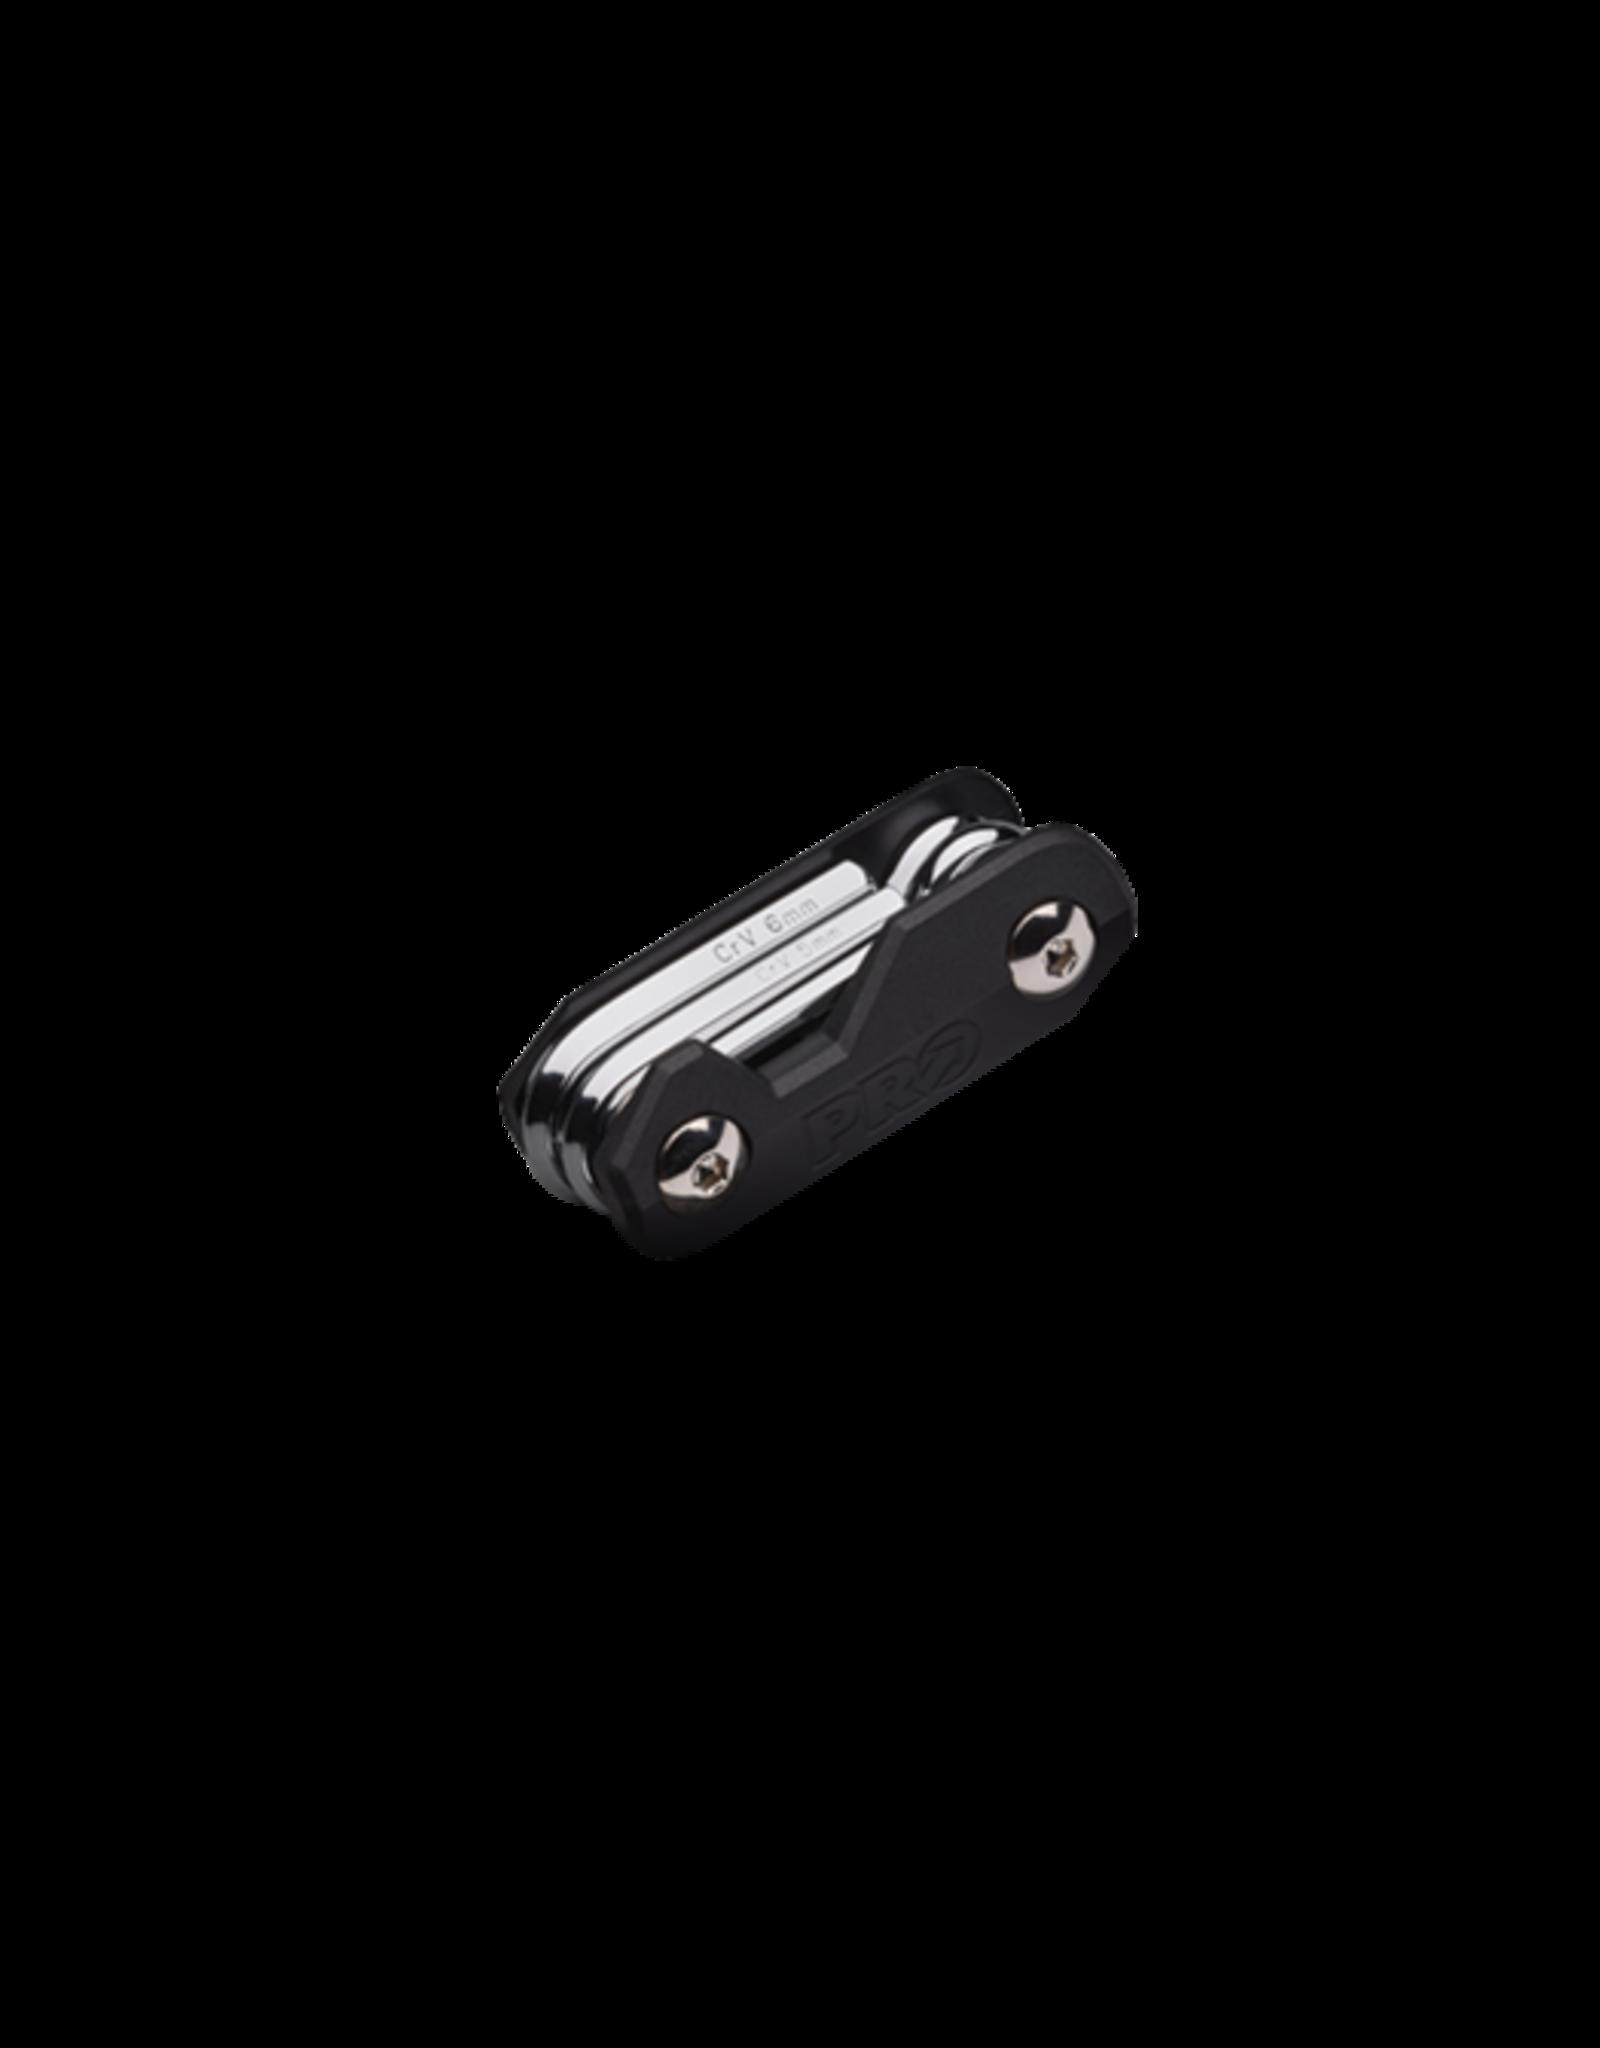 Shimano PRO, Mini Tool 6 Functions